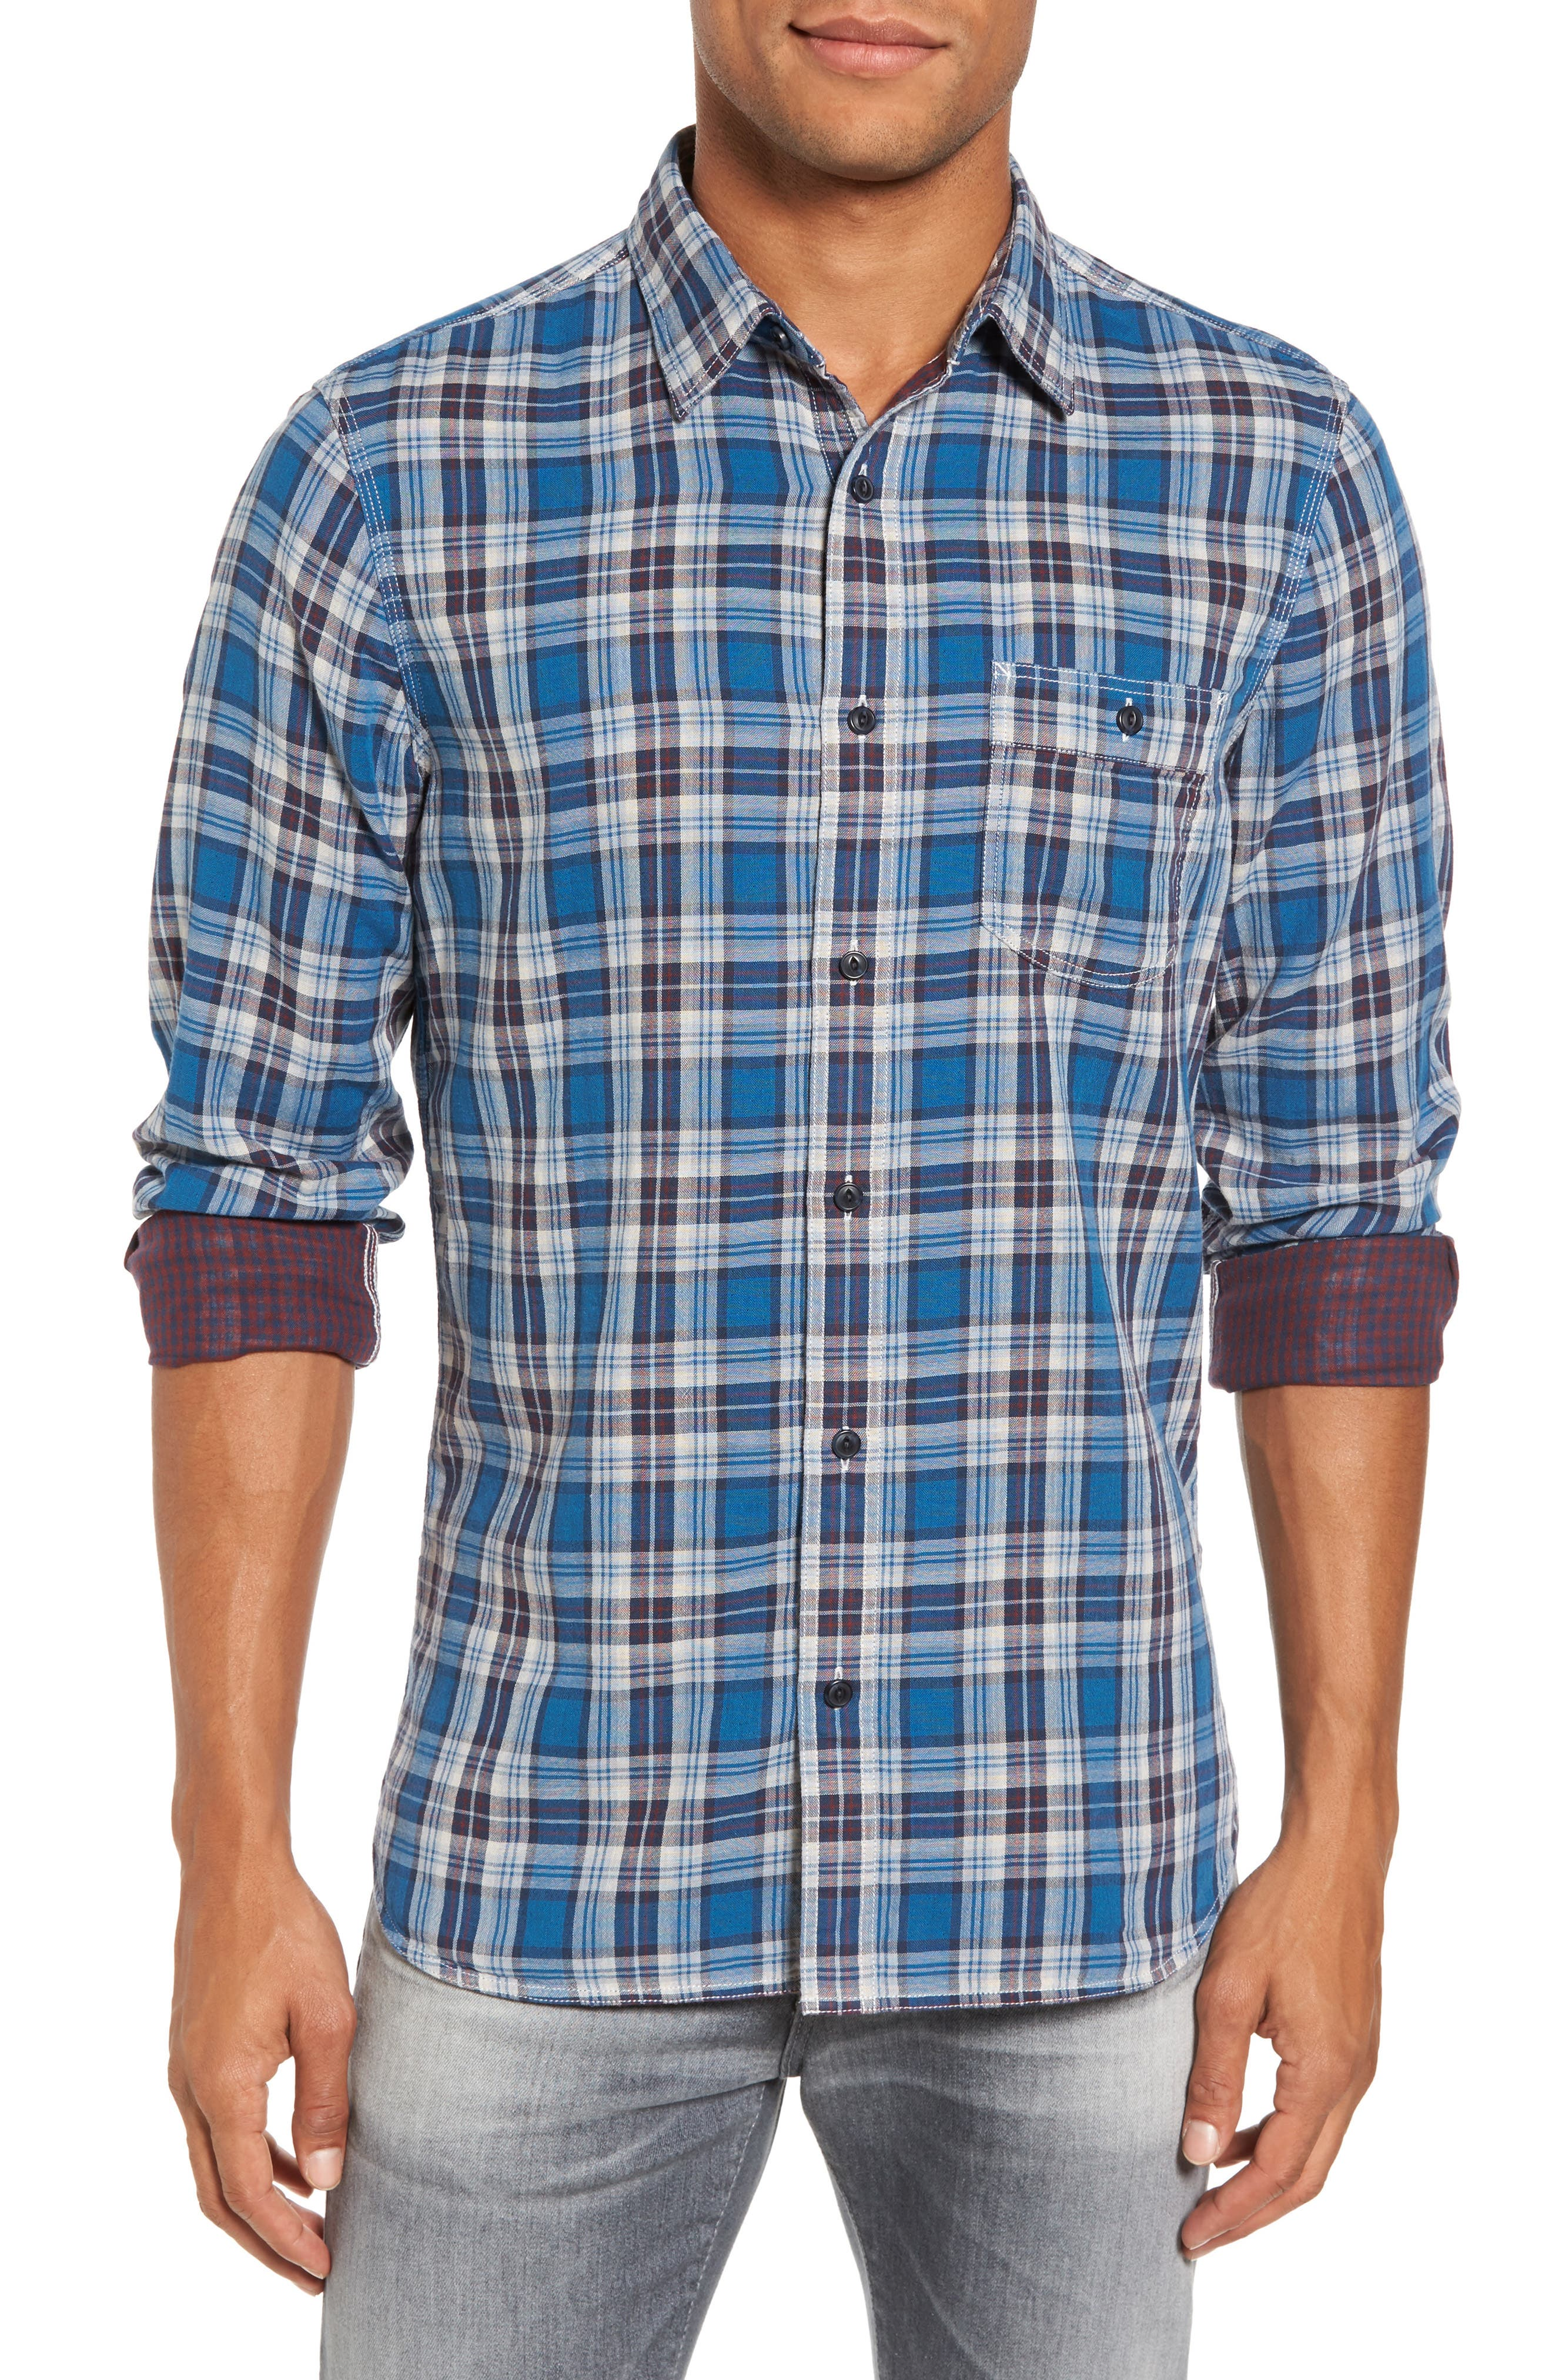 Alternate Image 1 Selected - Nordstrom Men's Shop Workwear Duofold Plaid Sport Shirt